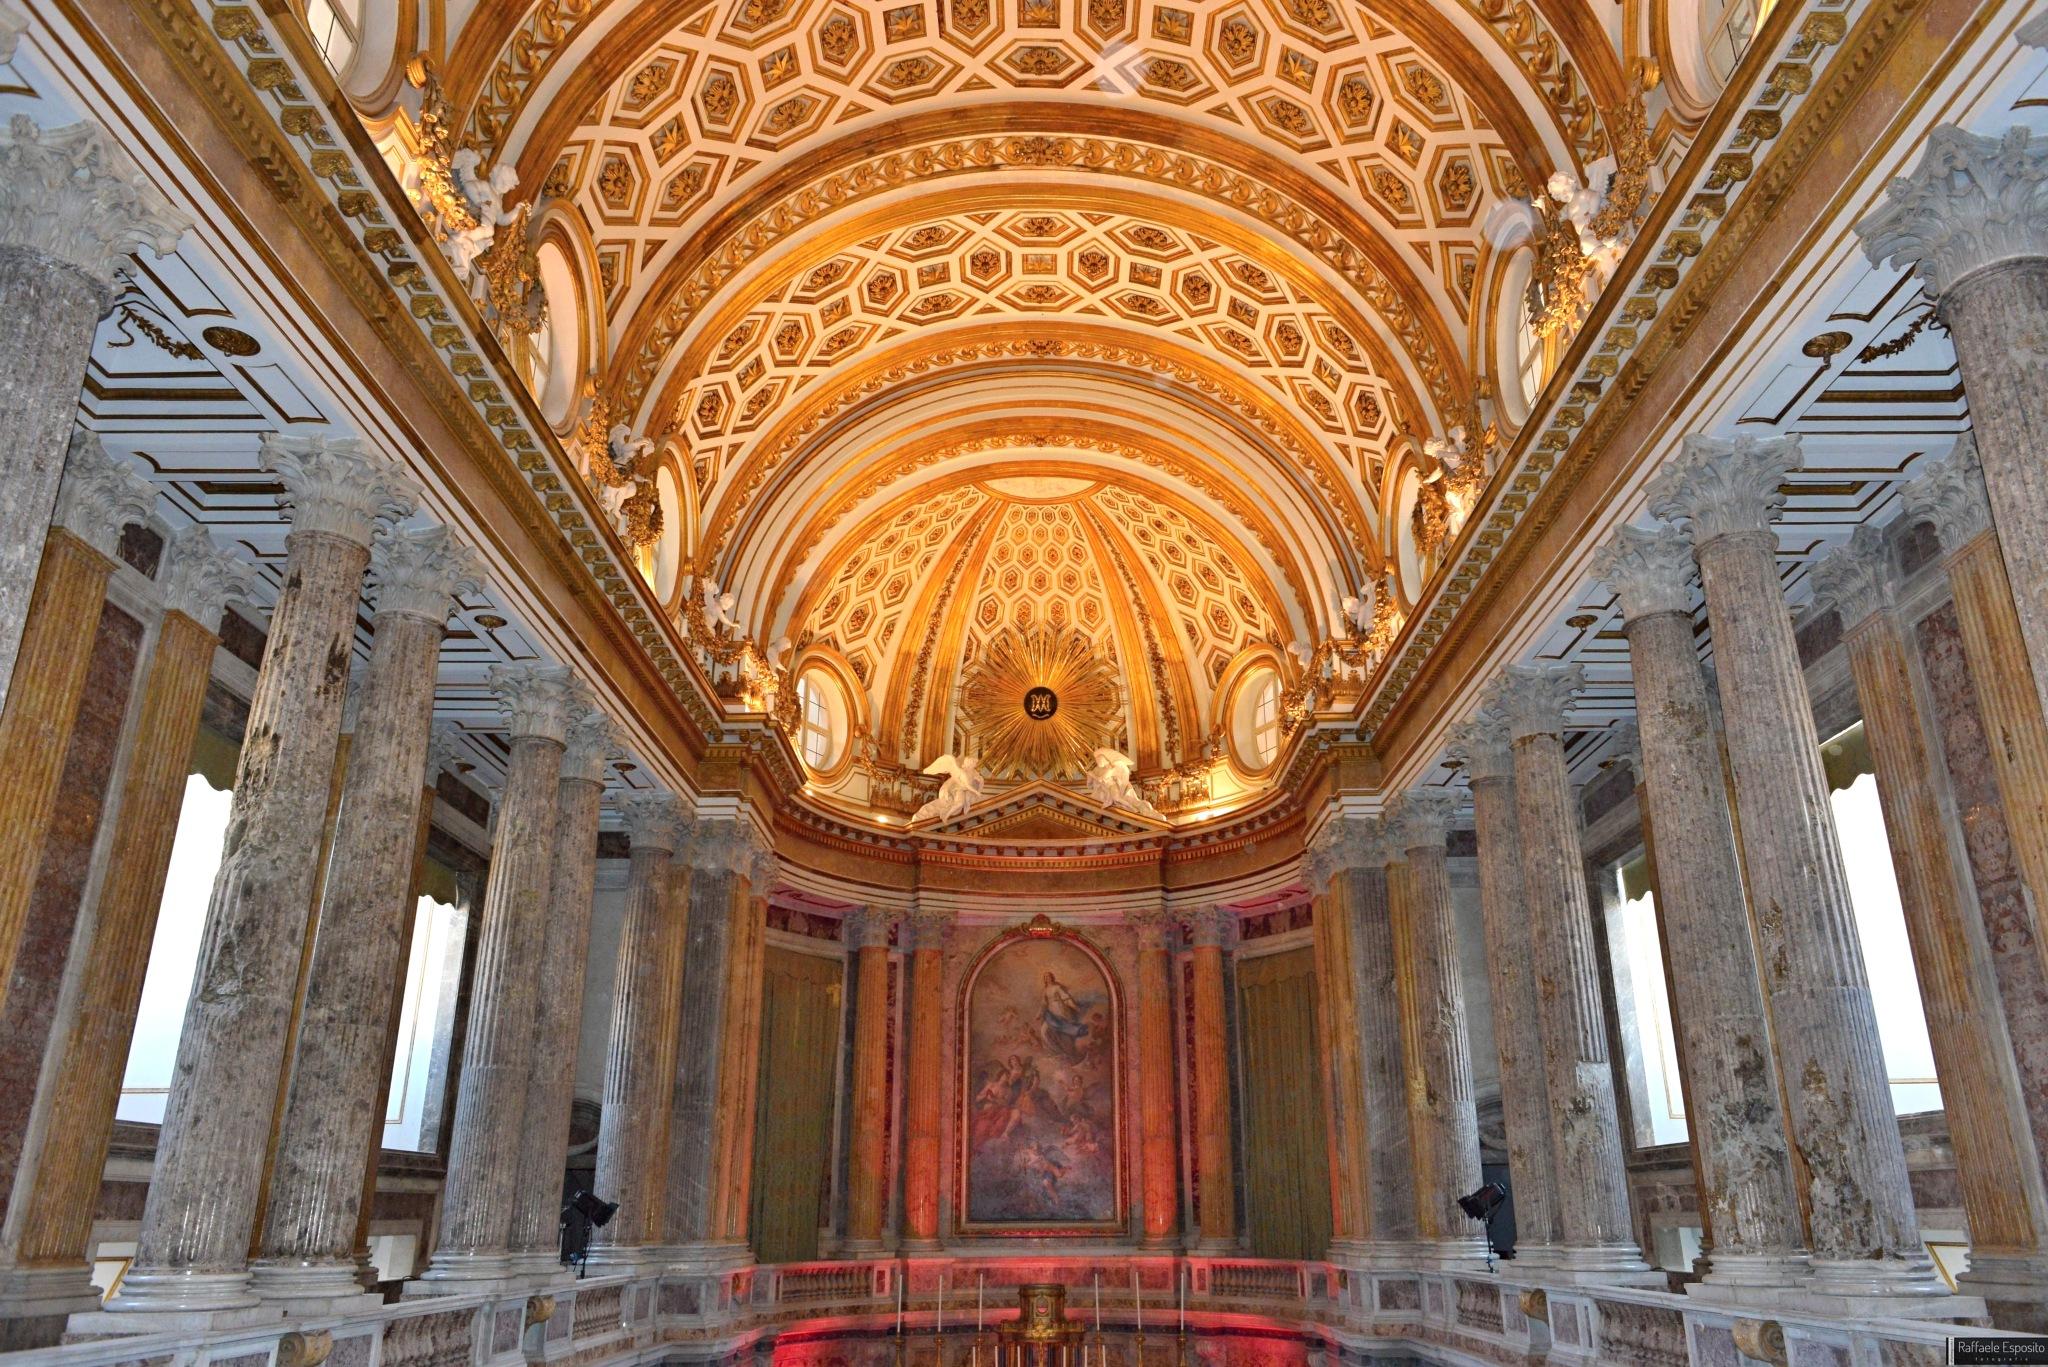 Cappella Palatina by Raffaele Esposito